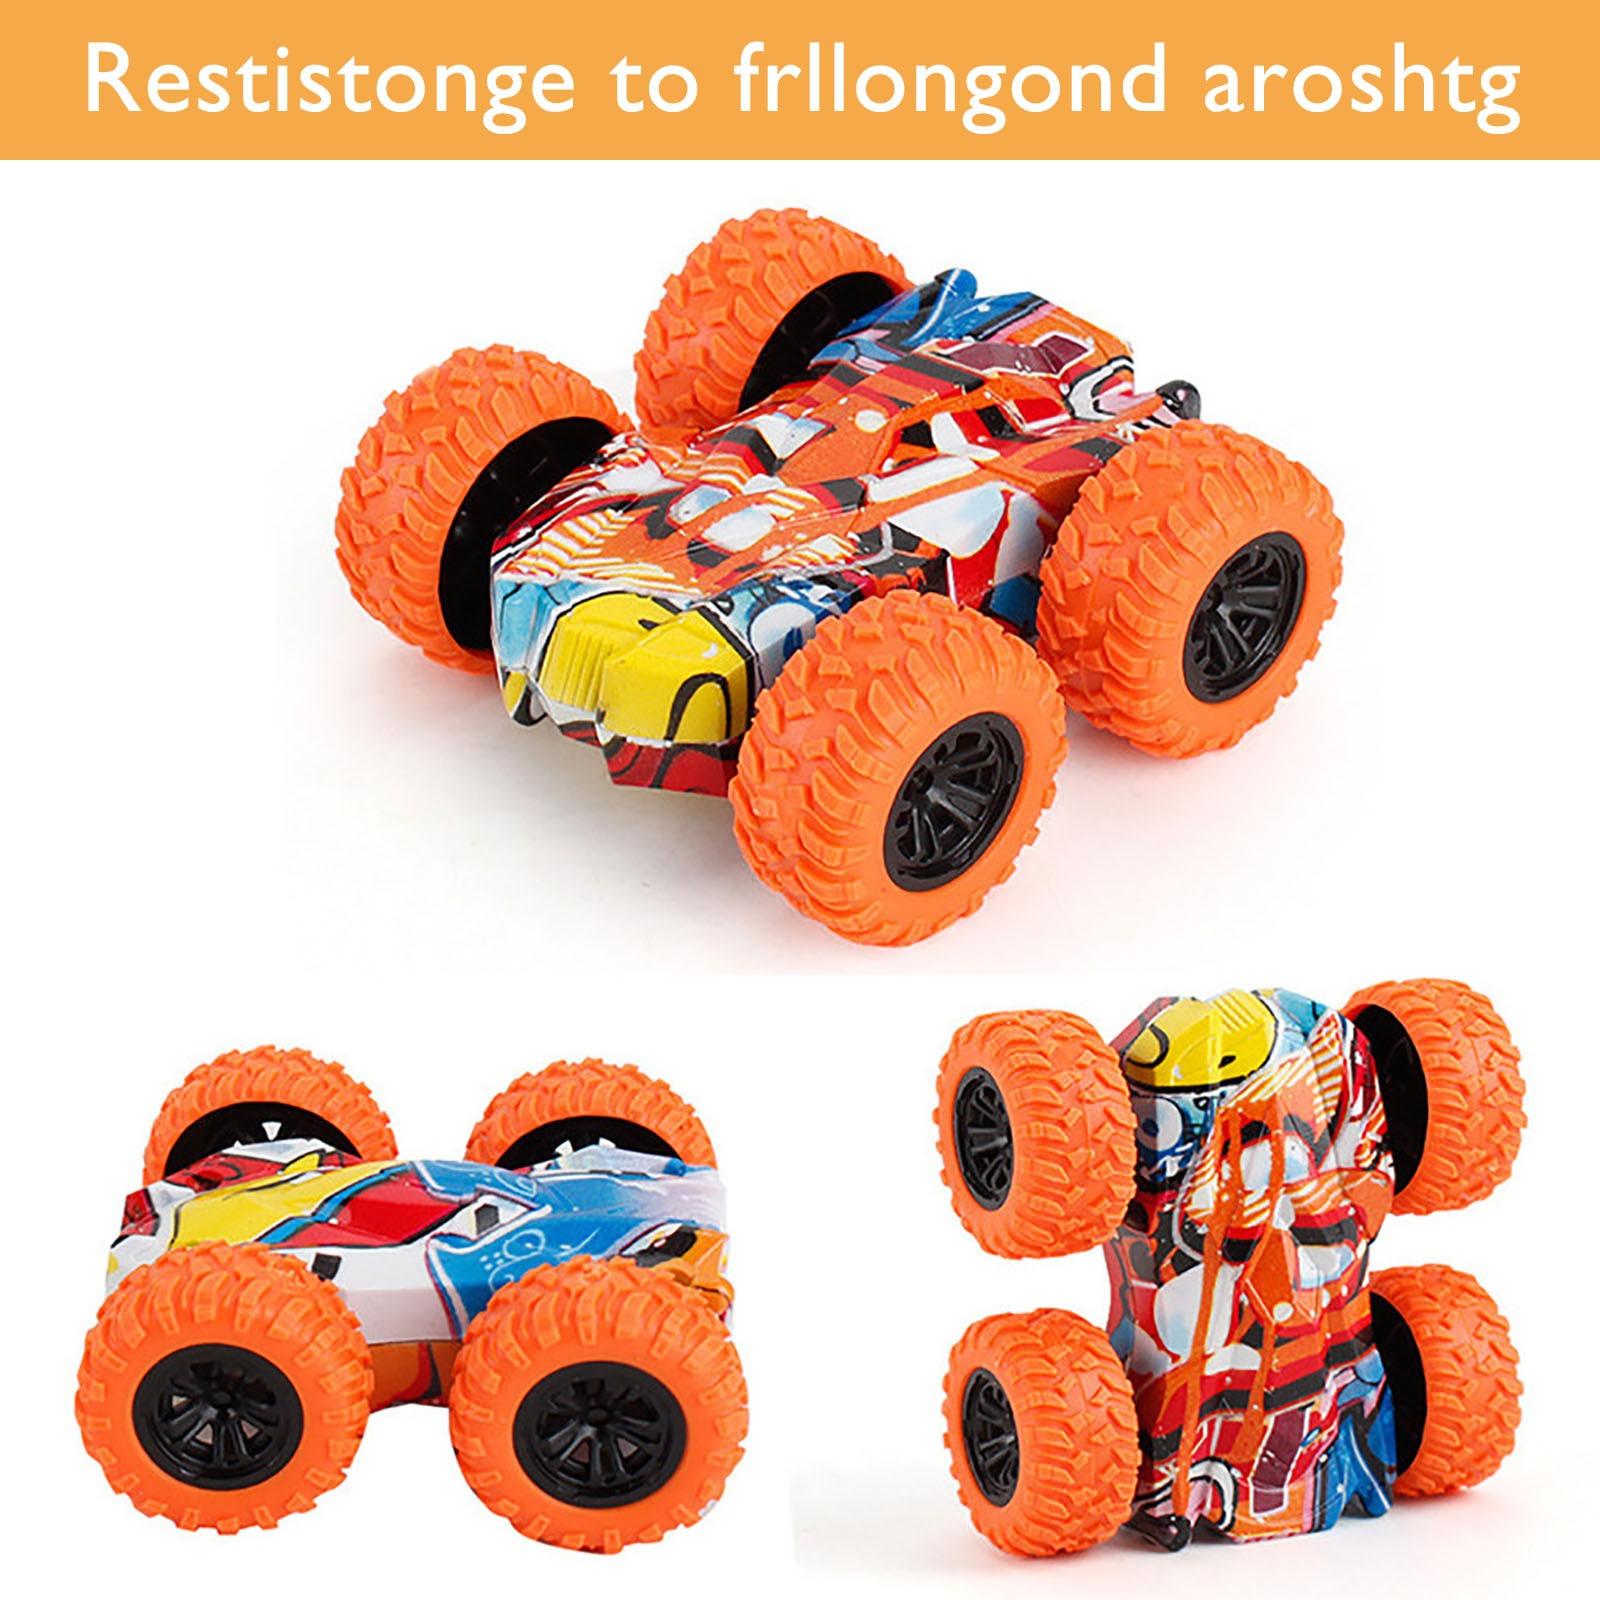 игрушки RC Inertia-Double Side Stunt Graffiti Roll Car Rotating RC Car Toy Off-Road Model Car